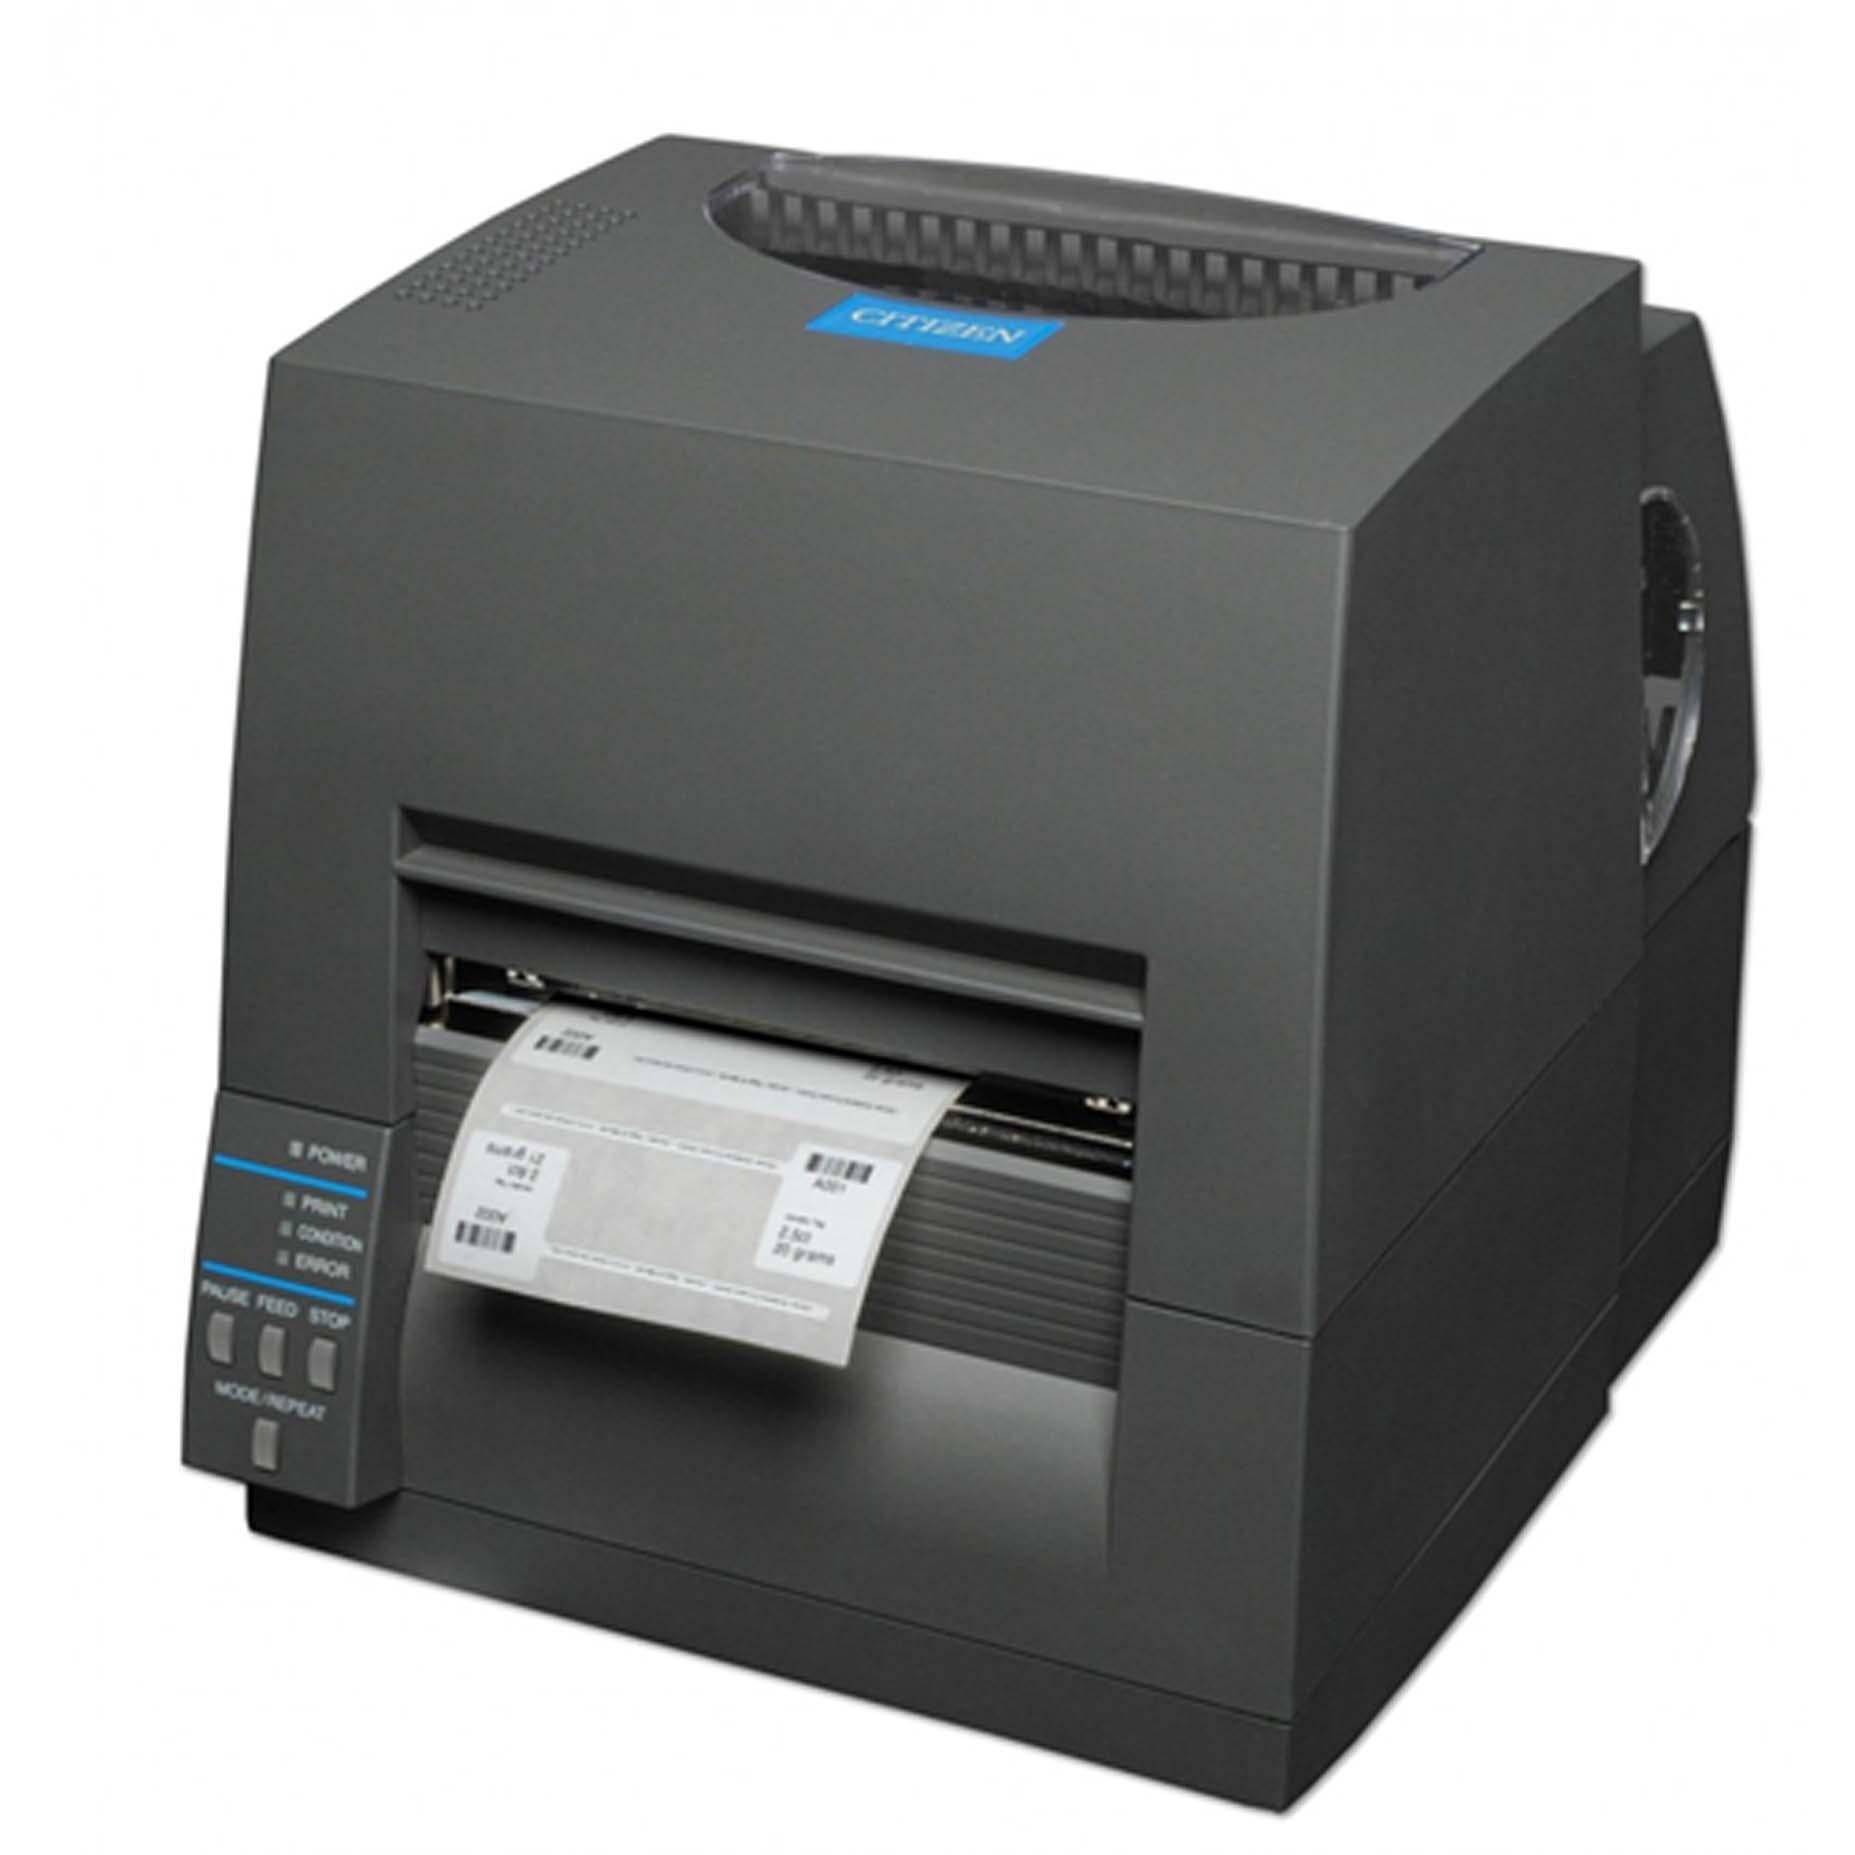 Harga Jual Citizen CL-S631 Label Barcode Printer 300 dpi USB Black